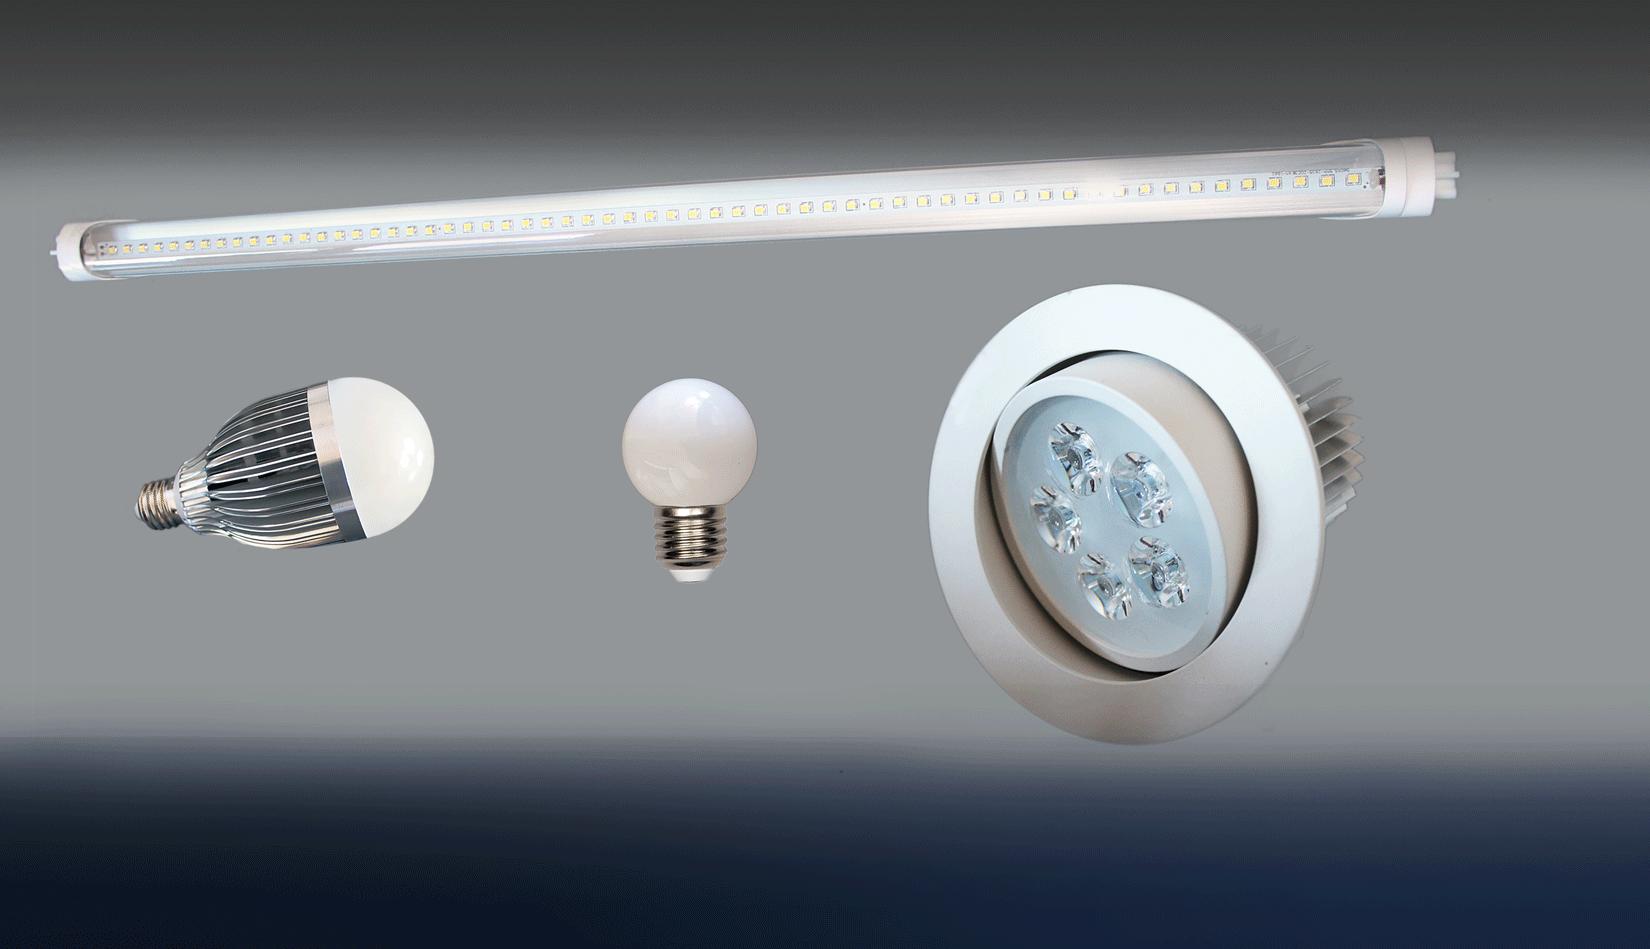 Risparmio energetico tramite la tecnologia a led mdt italia for Risparmio energetico led